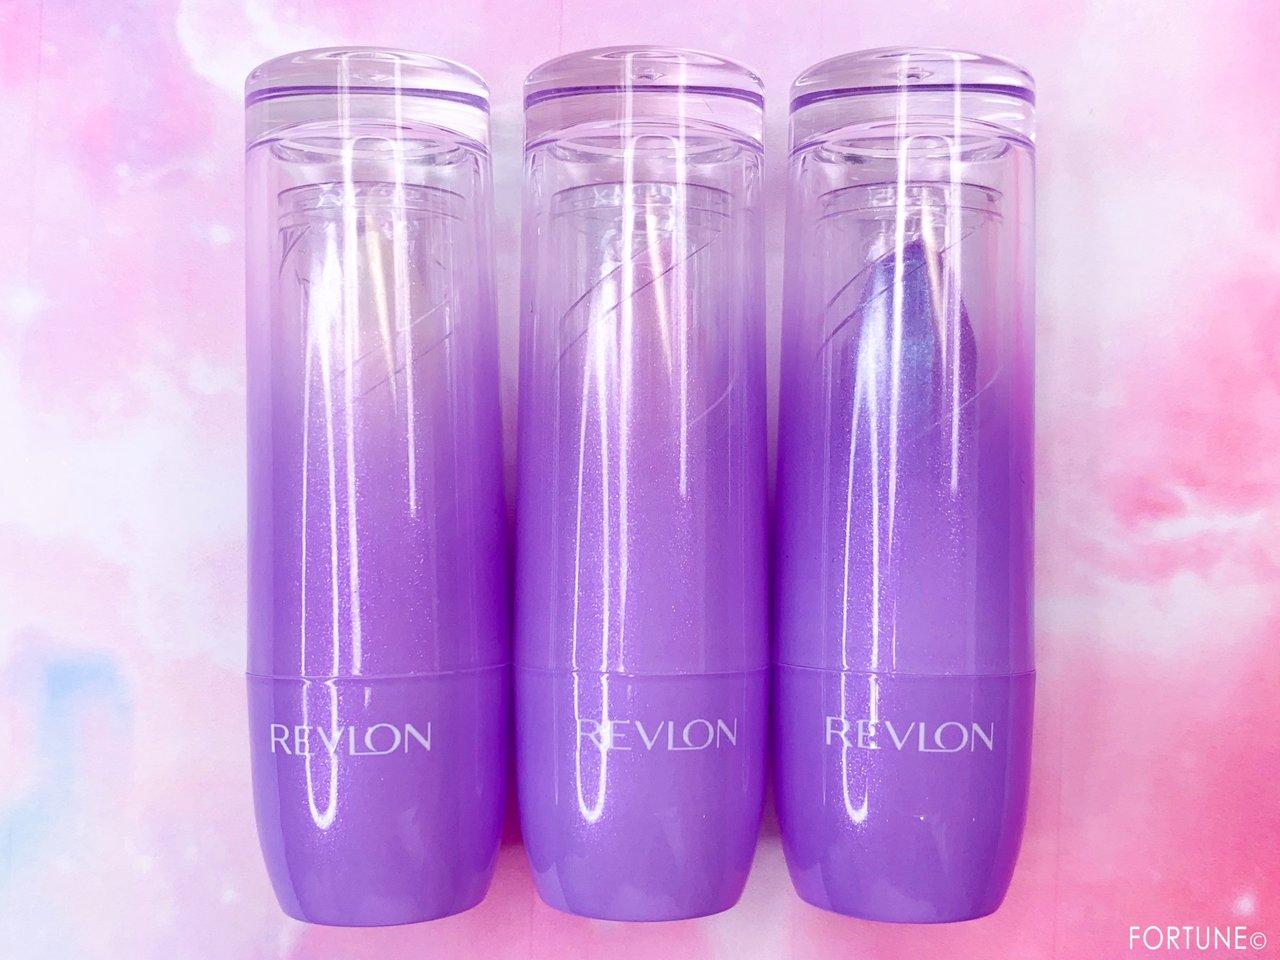 REVLON(レブロン) 2019春夏新作 レブロン クリスタル リップスティック